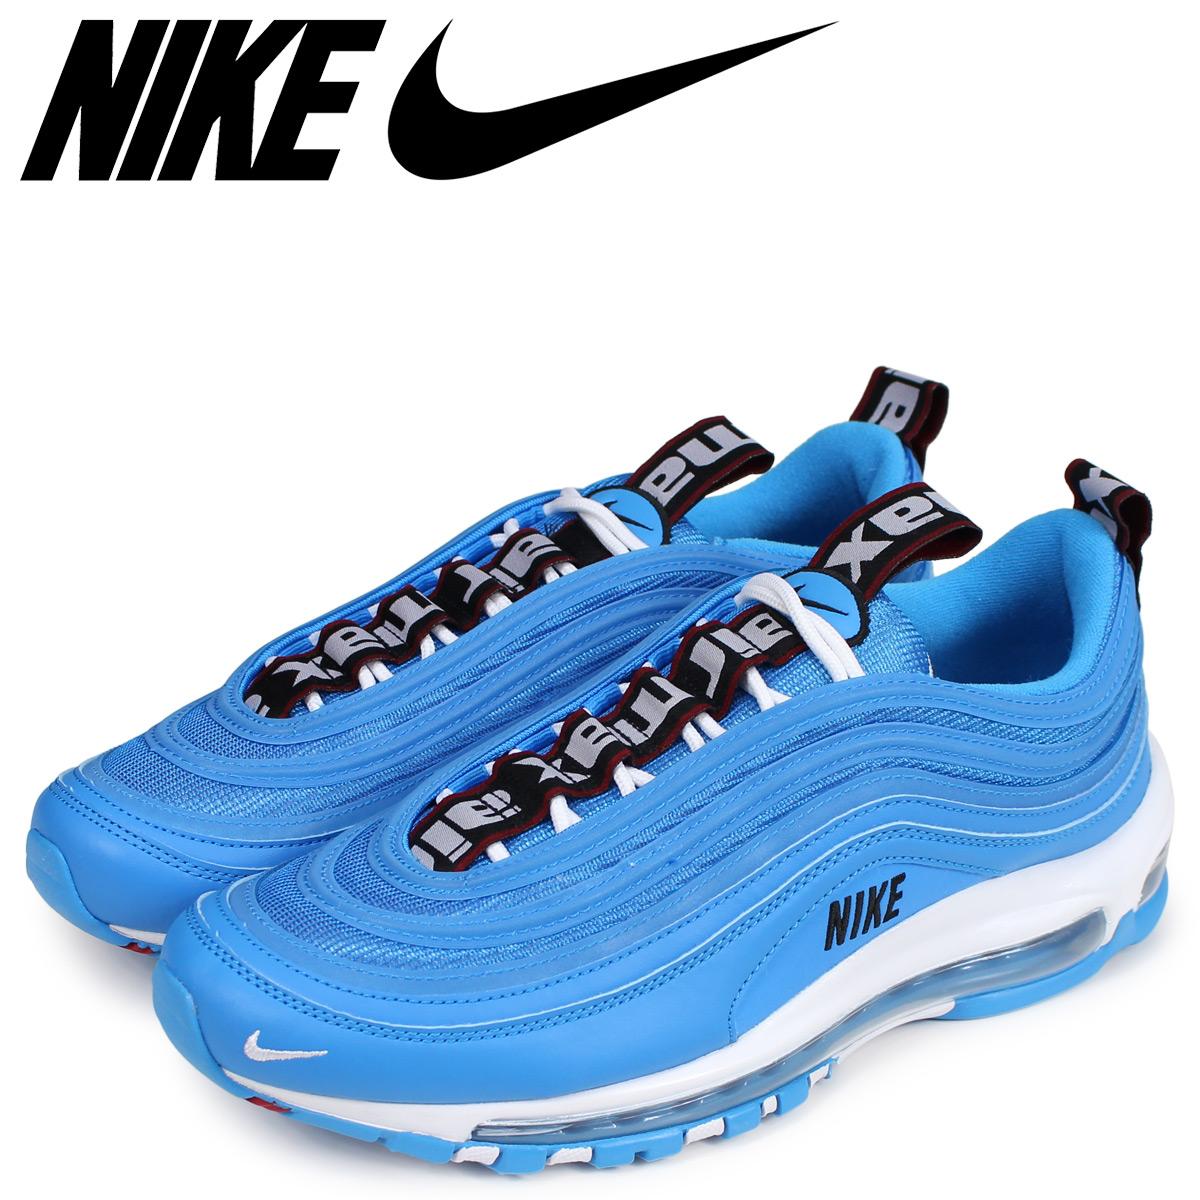 Sugar Online Shop  NIKE Kie Ney AMAX 97 sneakers men AIR MAX 97 PREMIUM blue  312 68d038966